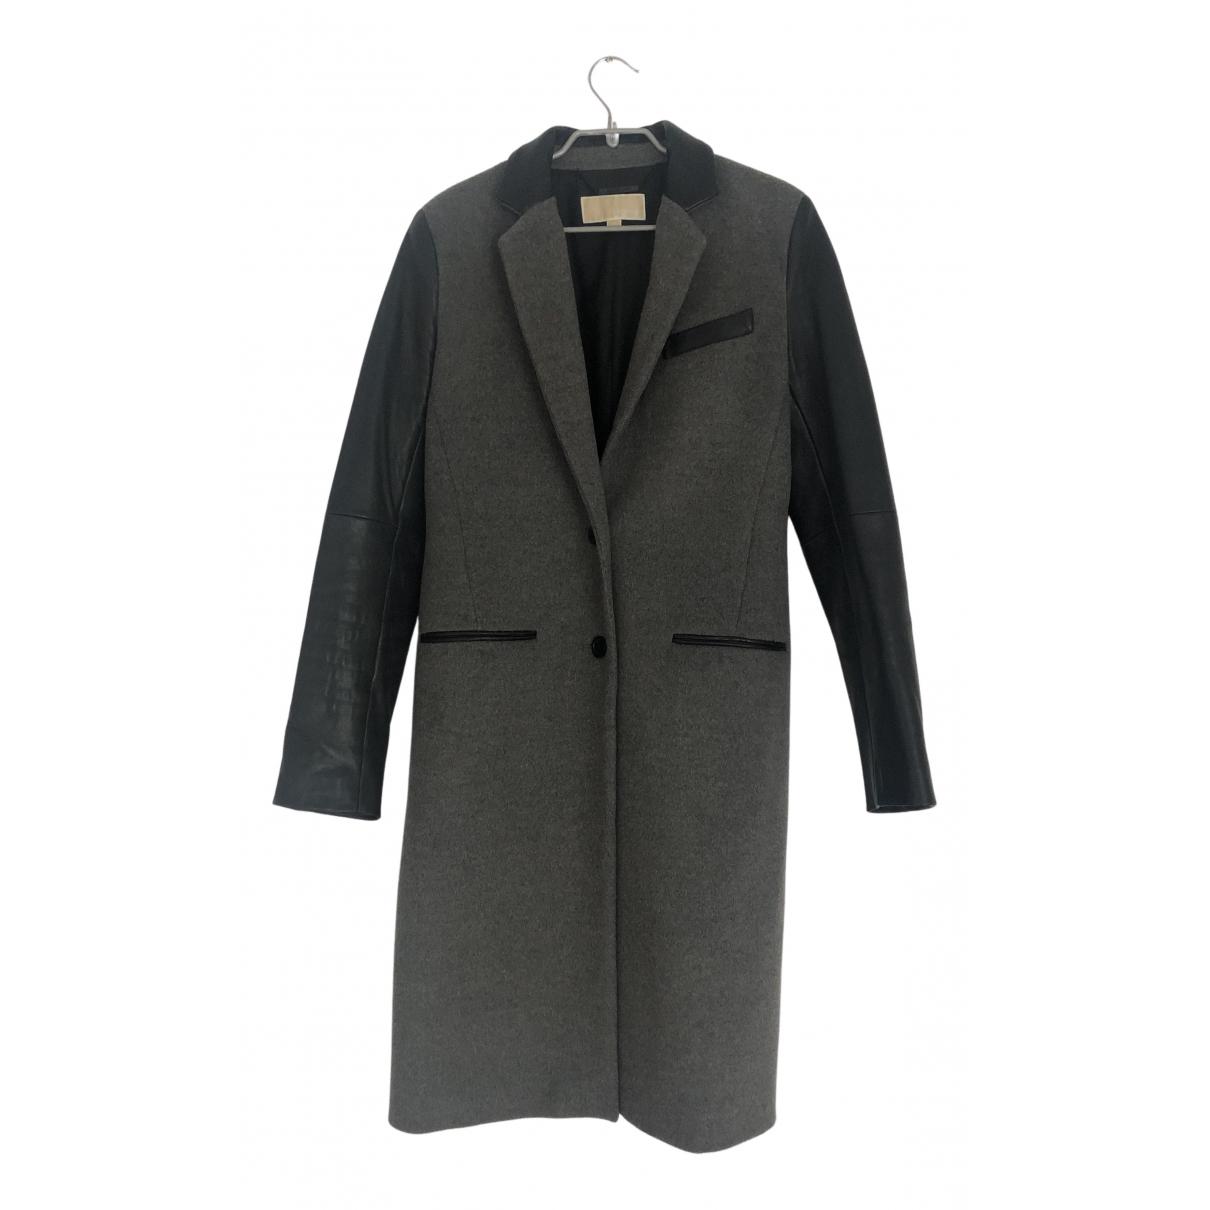 Michael Kors N Grey Wool coat for Women 4 US